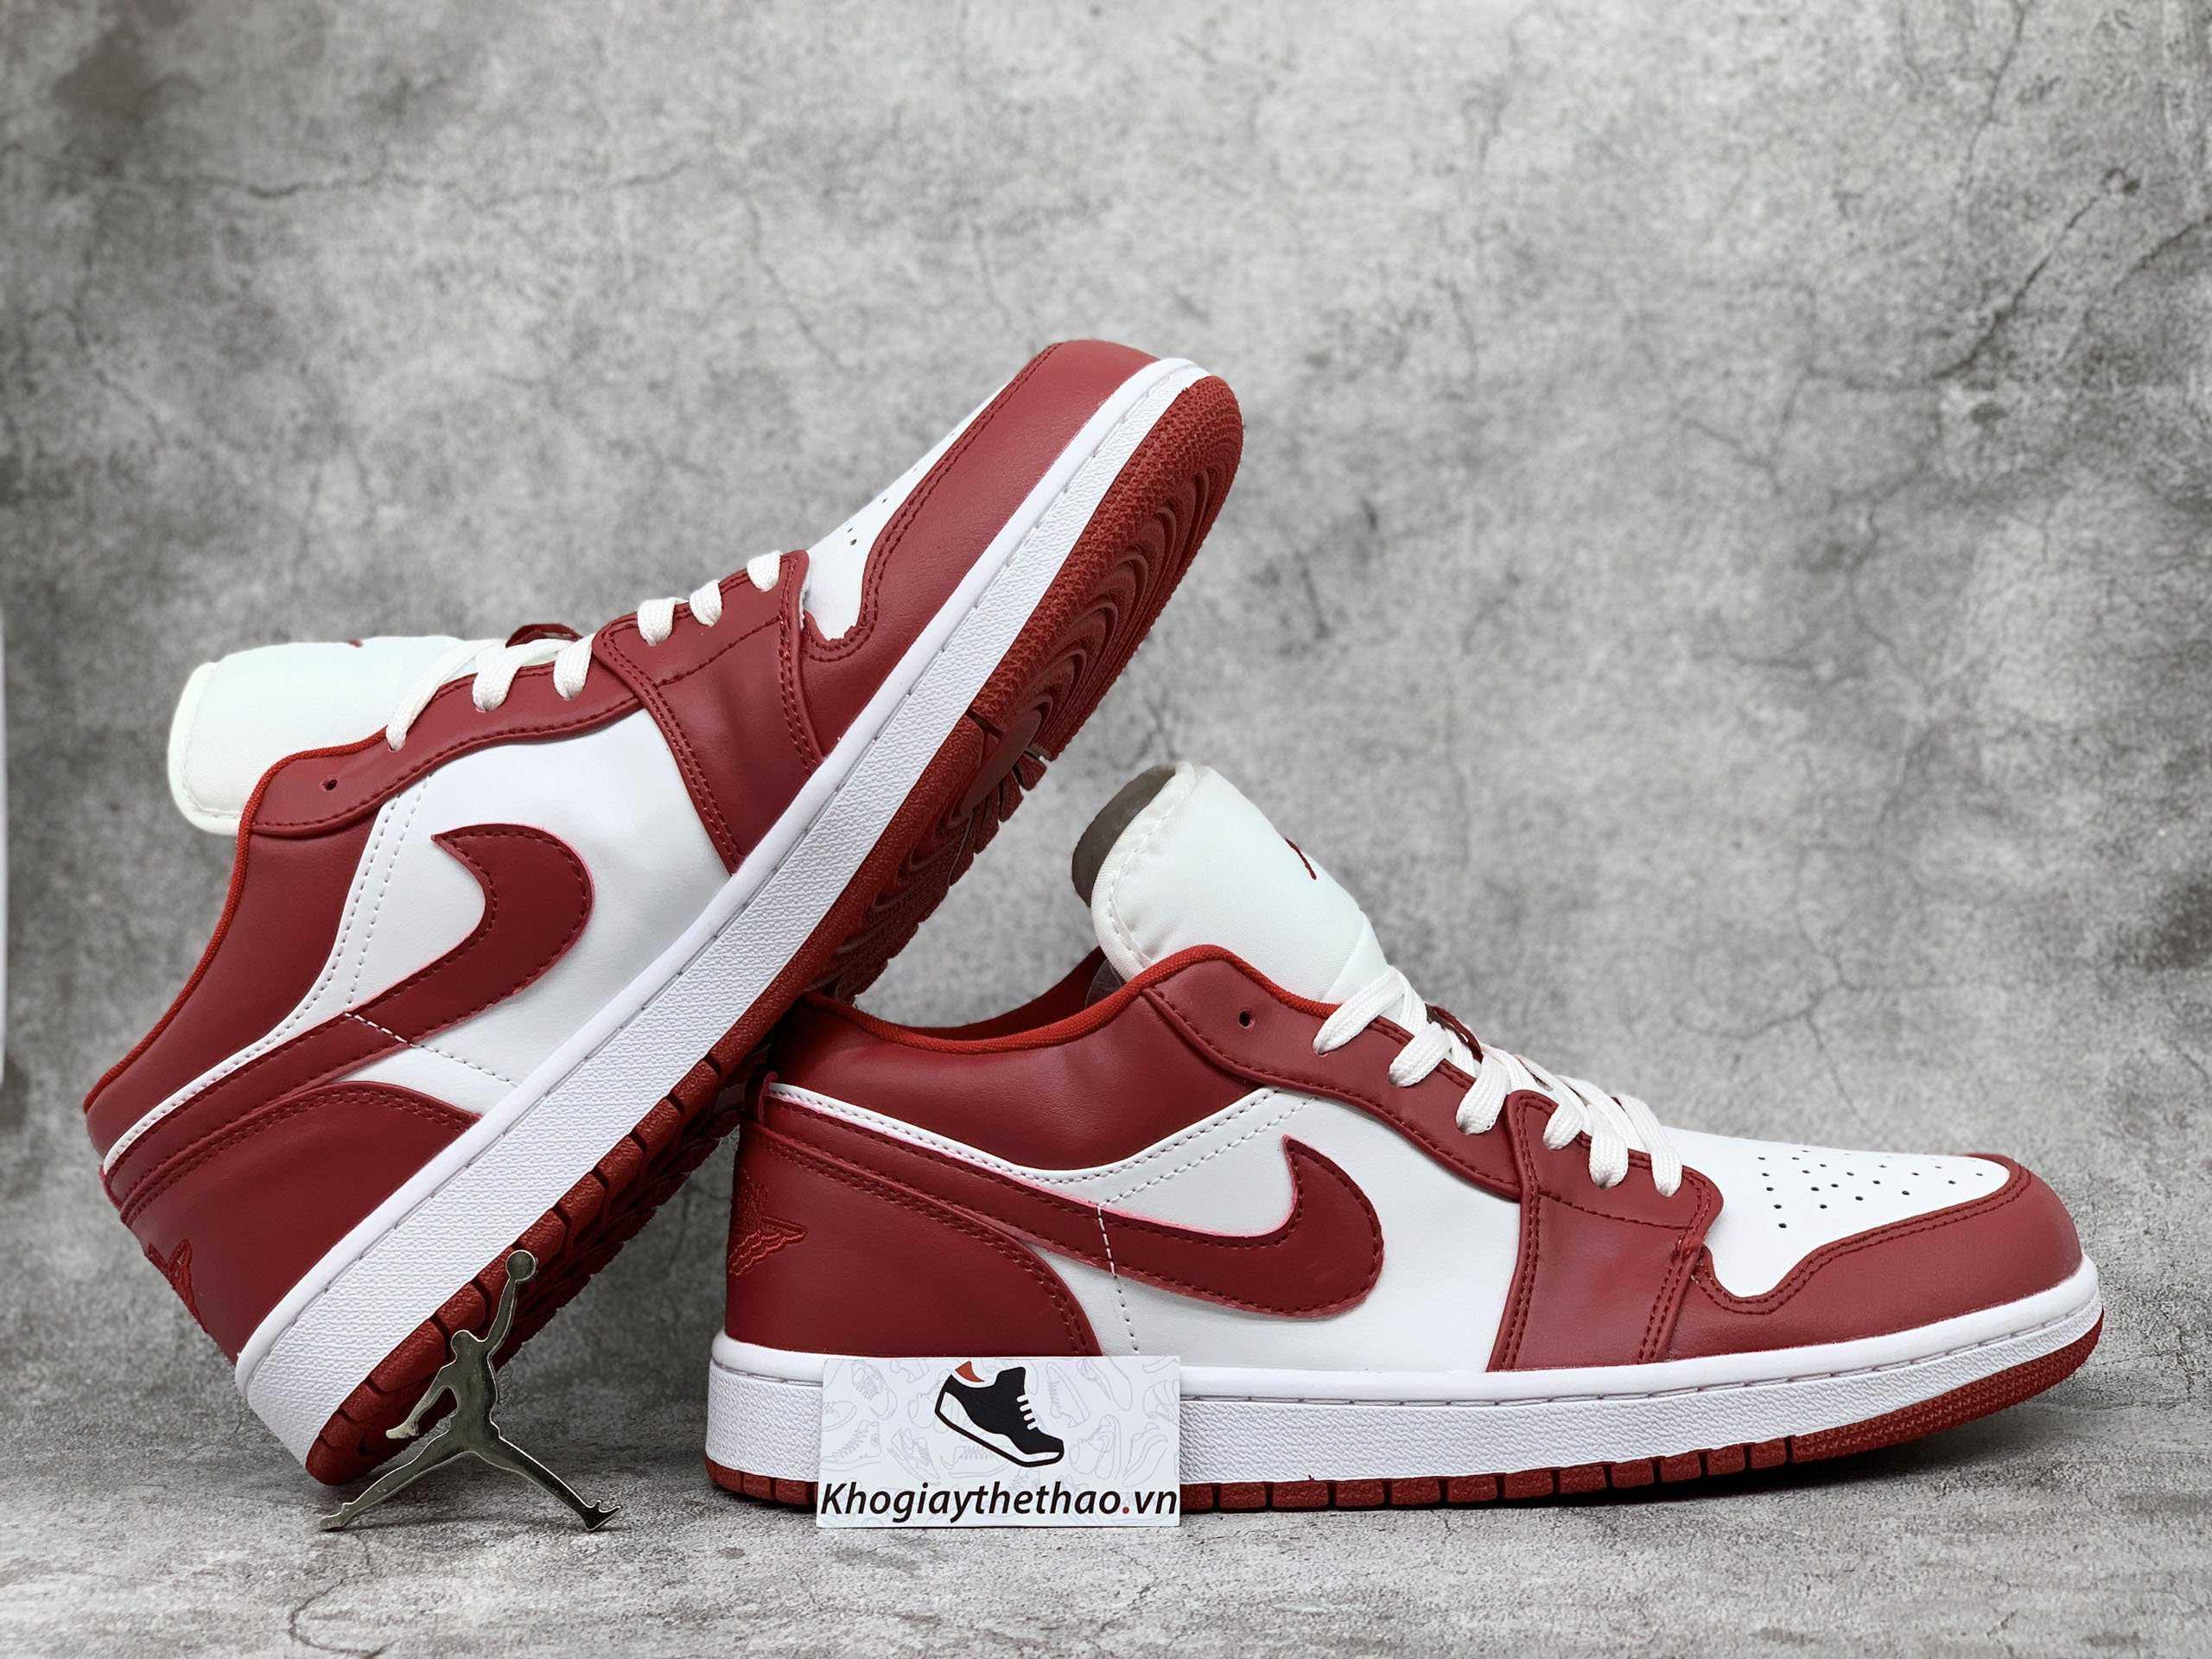 ảnh giày jordan 1 gym red replica 11 cố thấp